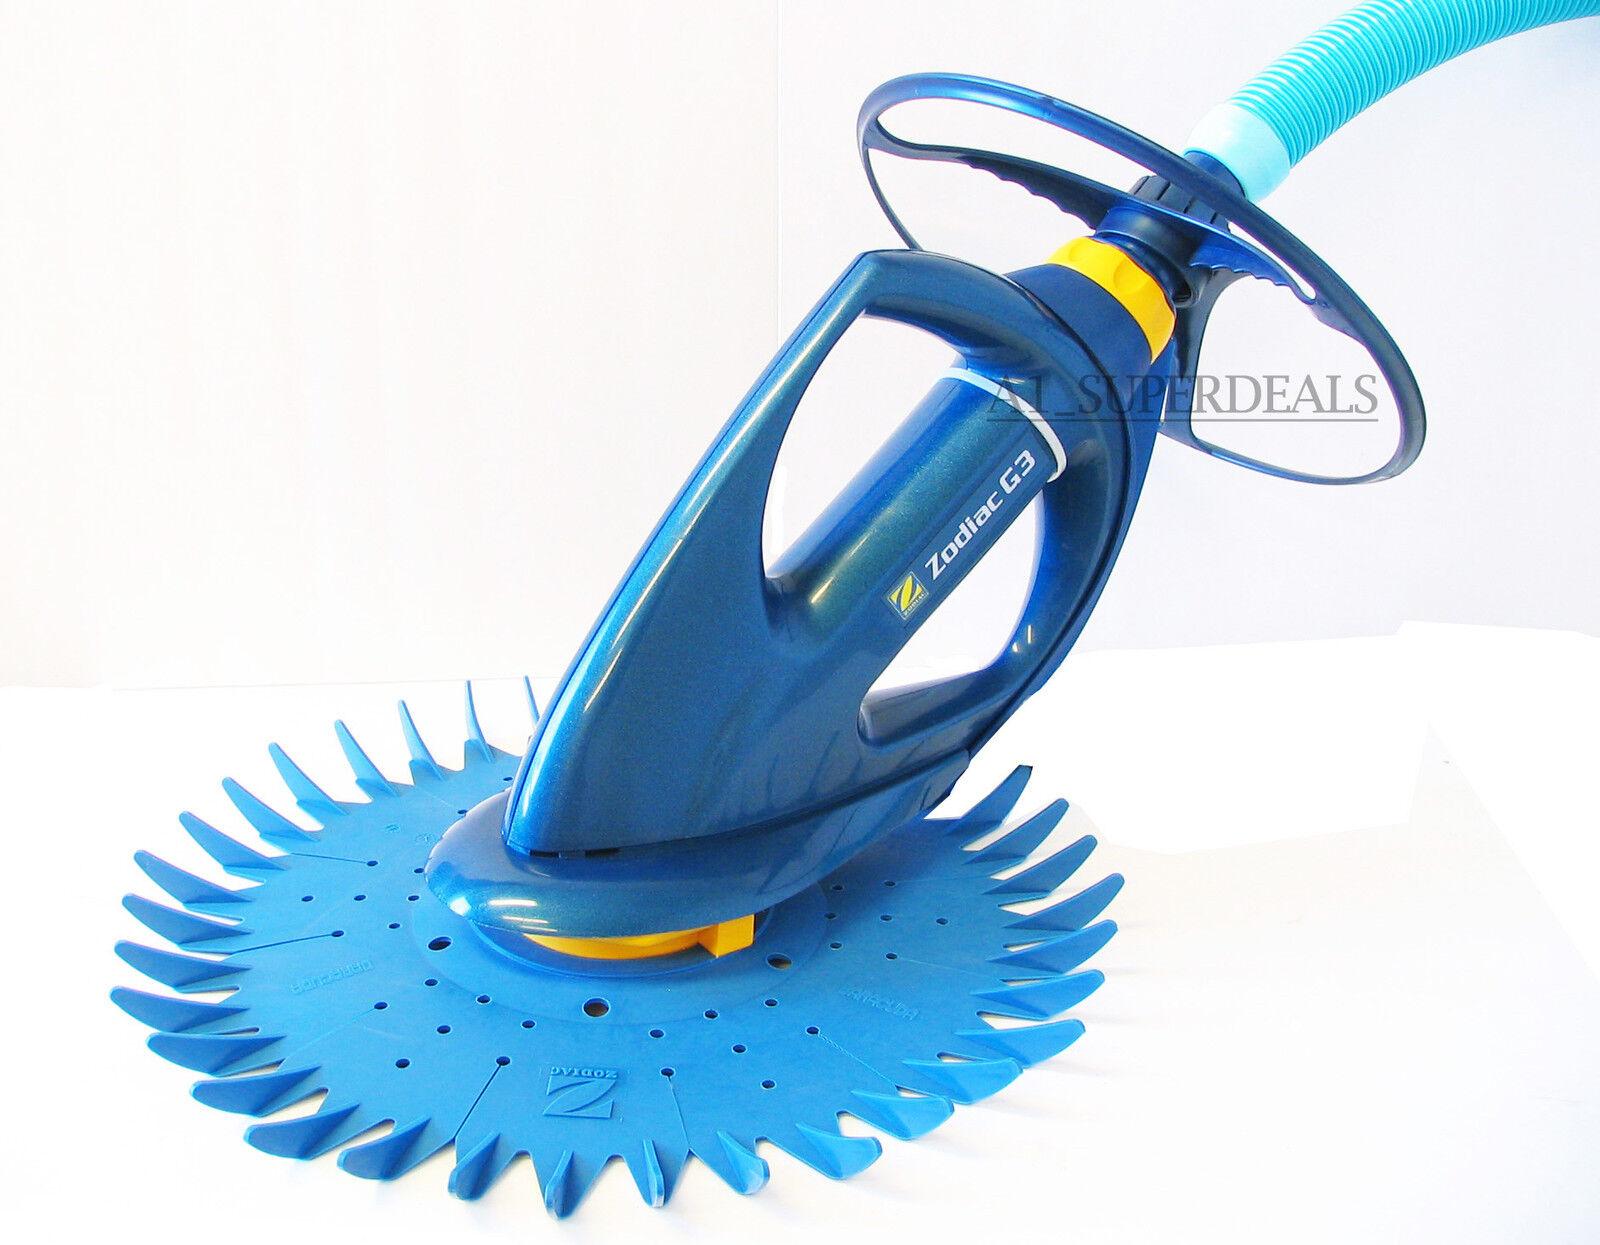 New Zodiac Baracuda G3 Automatic In Ground Swimming Pool Cleaner 746823030007 Ebay